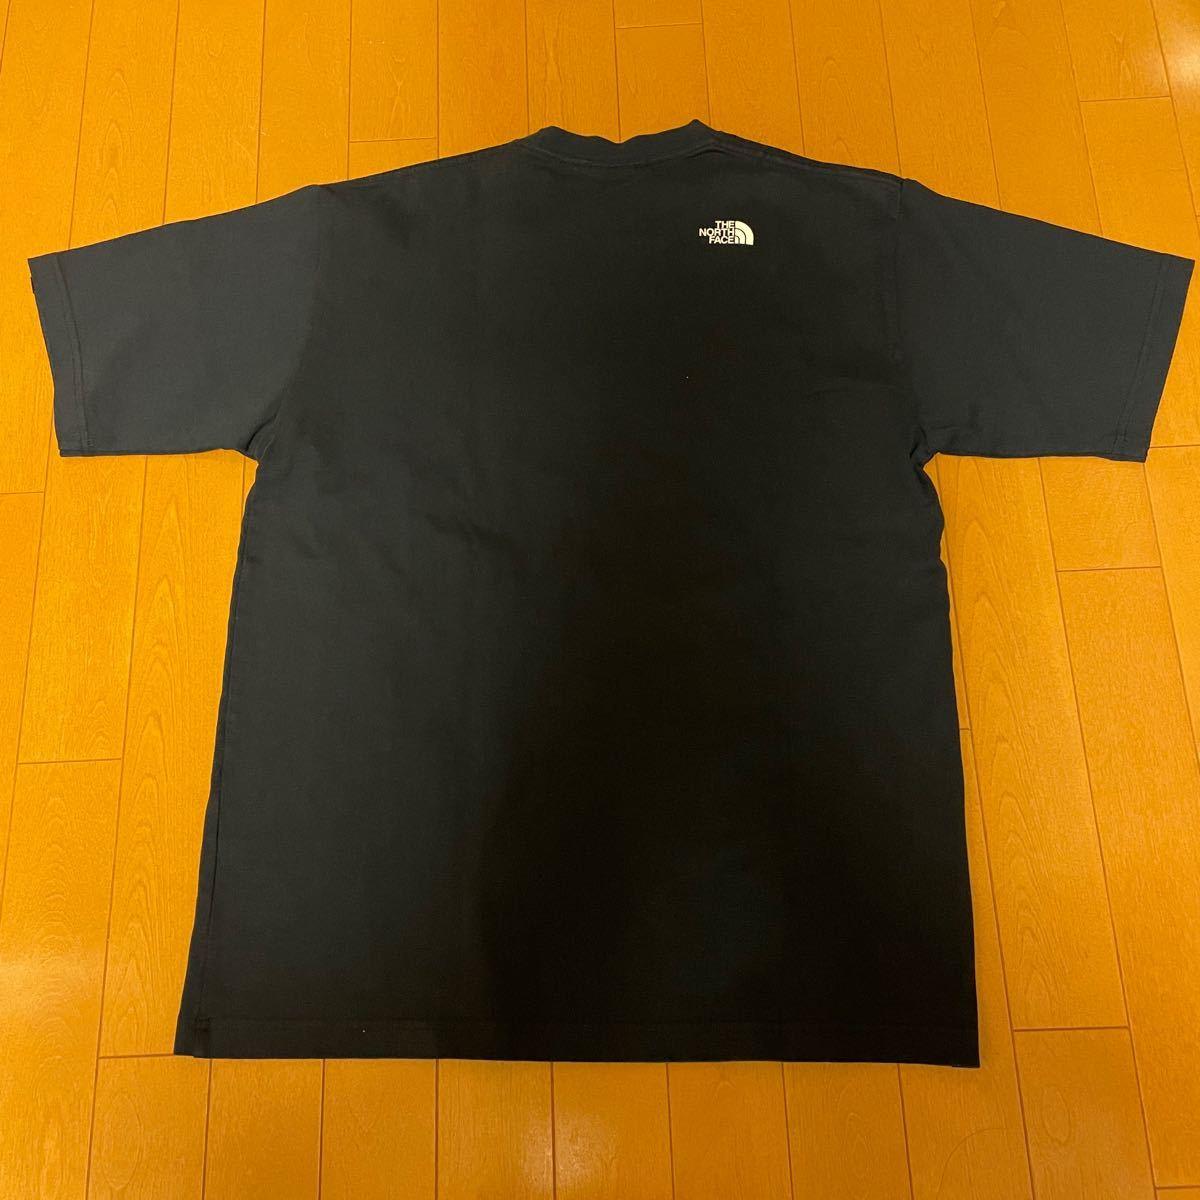 THE NORTH FACE  ロゴTシャツ  ザノースフェイス  Tee